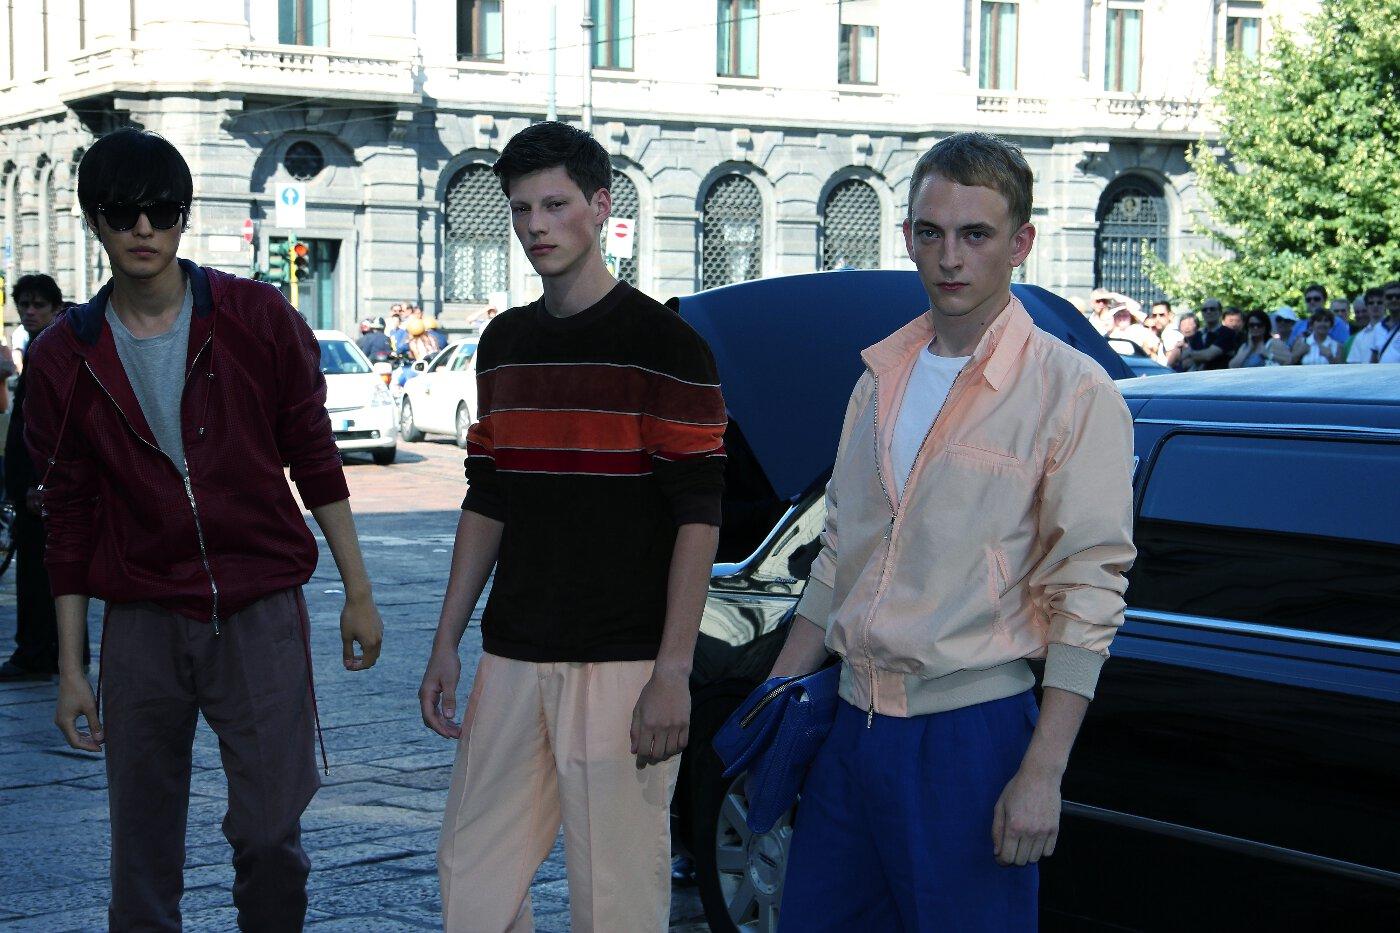 trussardi-ss-spring-summer-2012-milano-fashion-week-trussardi